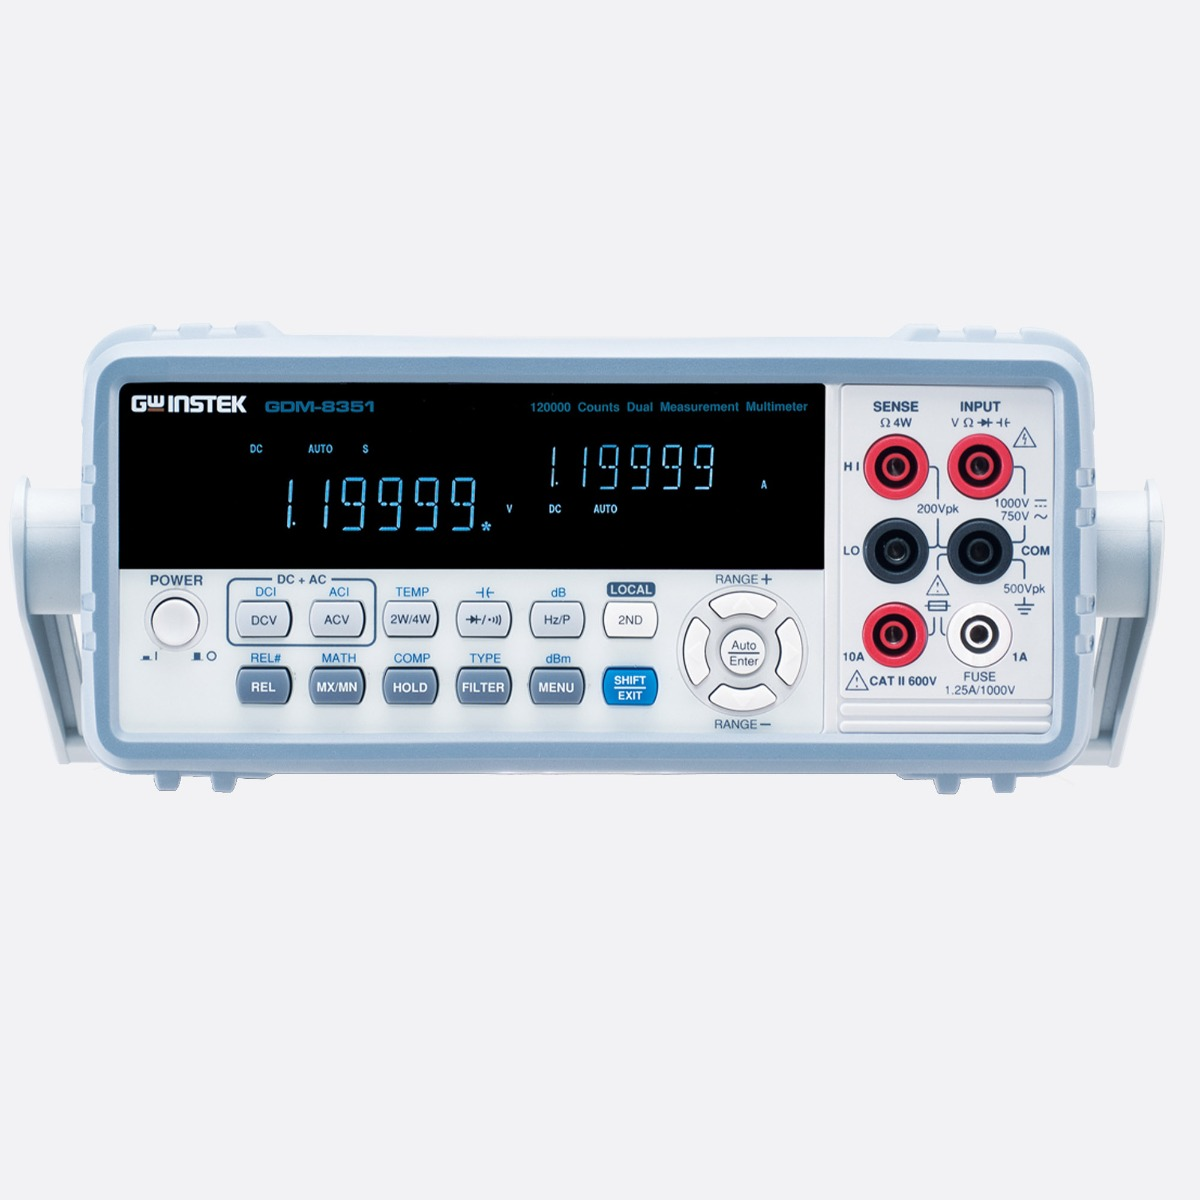 GWInstek_GDM-8351_front_Ccontrols